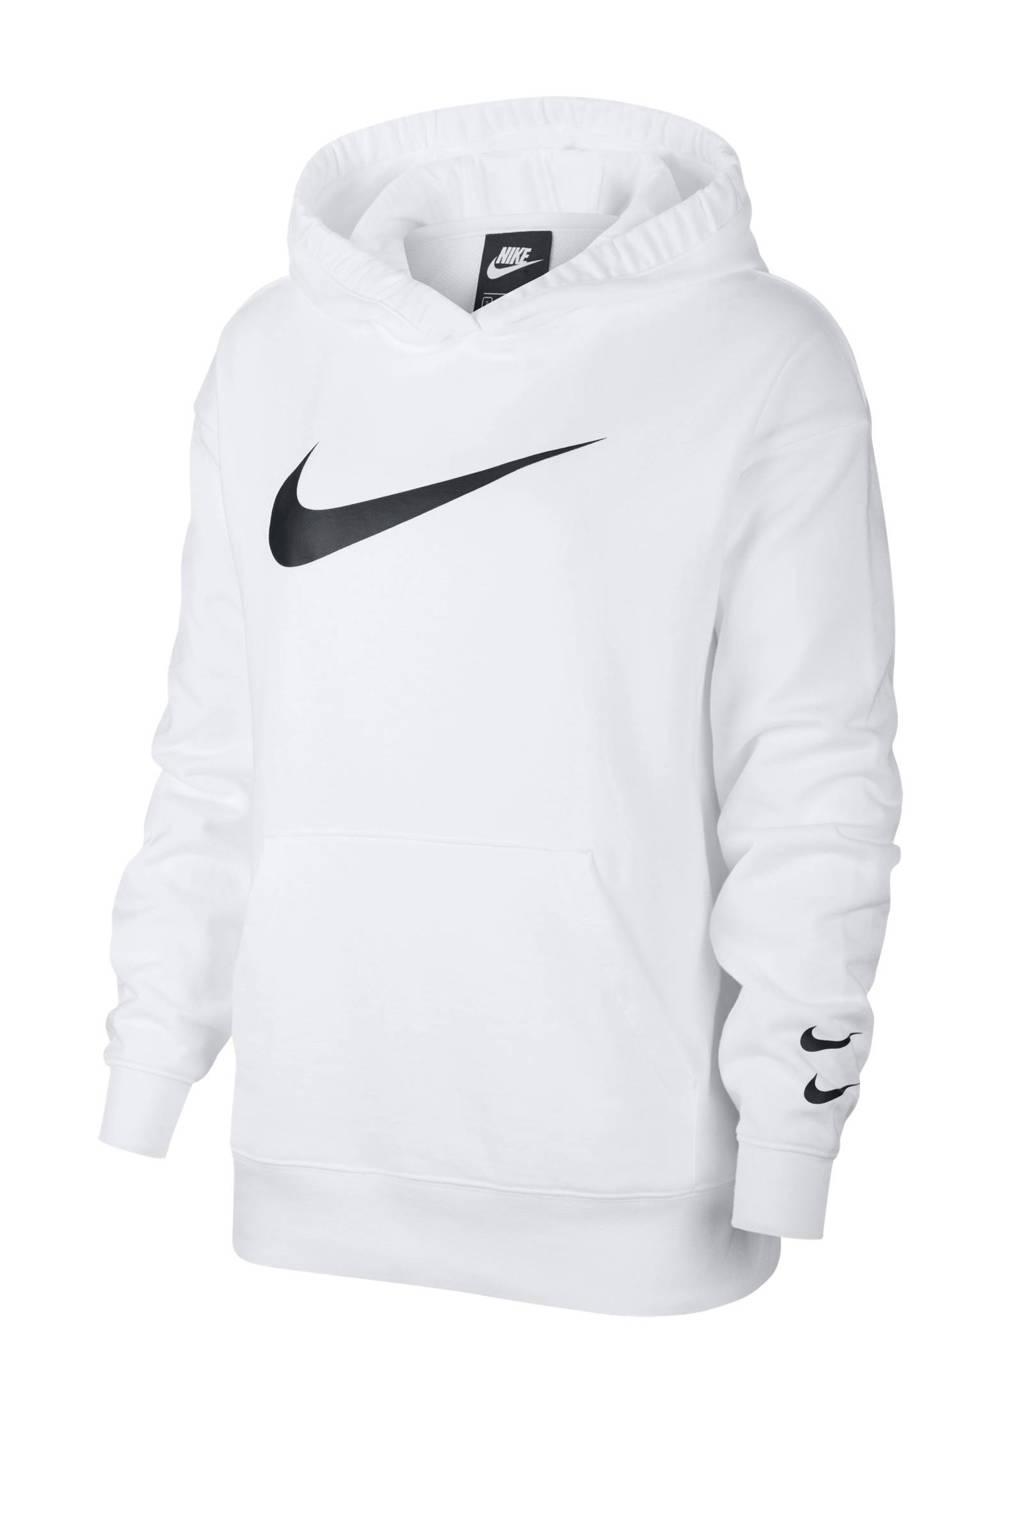 Nike hoodie wit/zwart, Wit/zwart